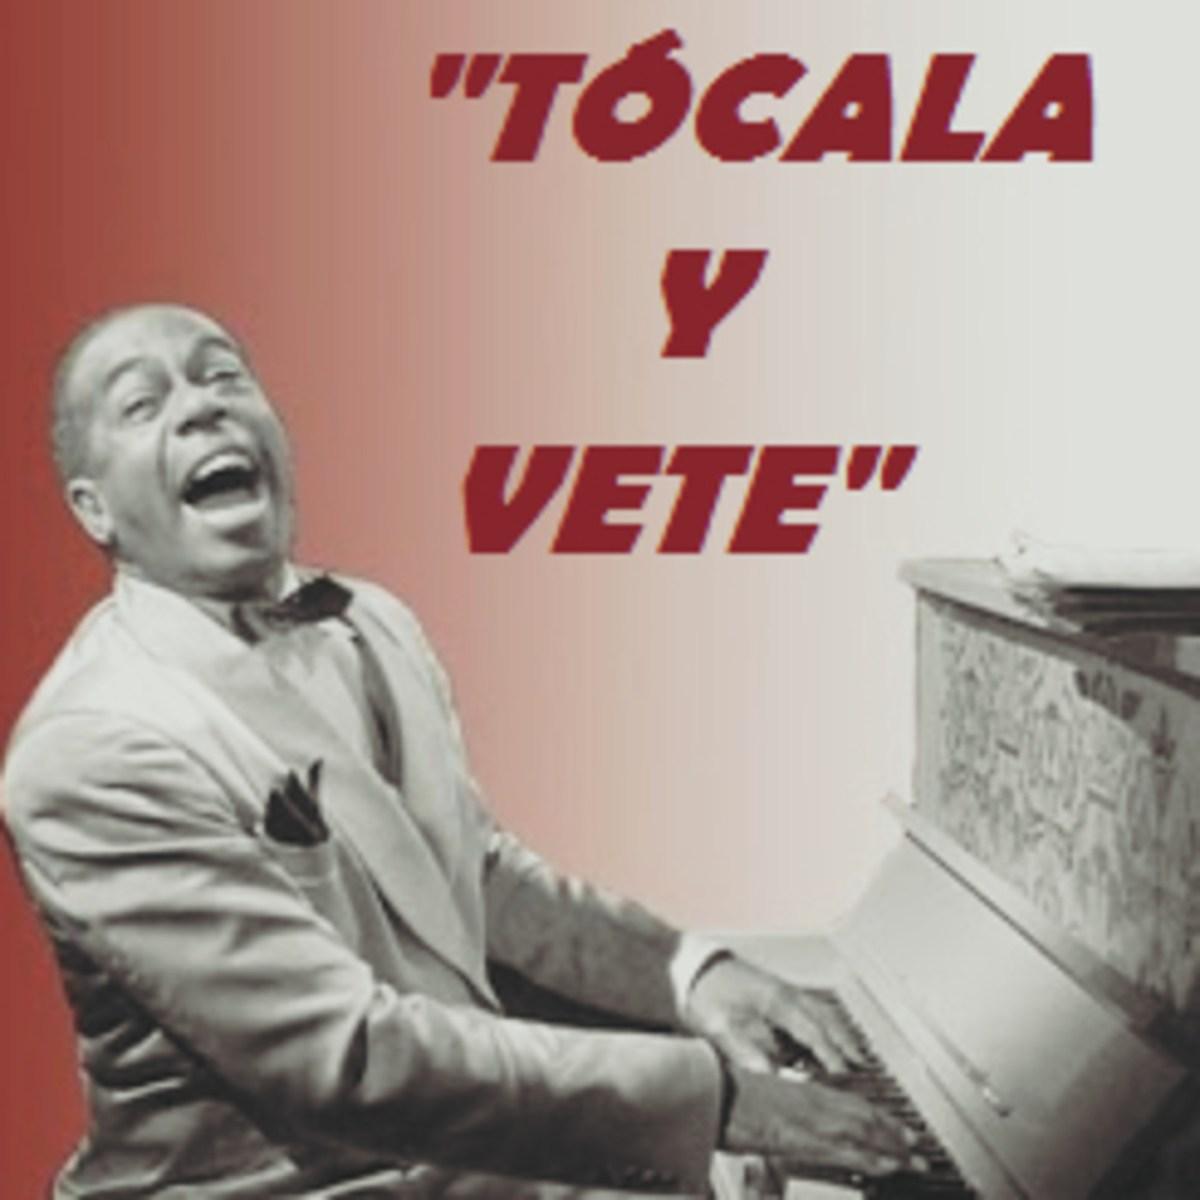 Tócala y Vete 2.0